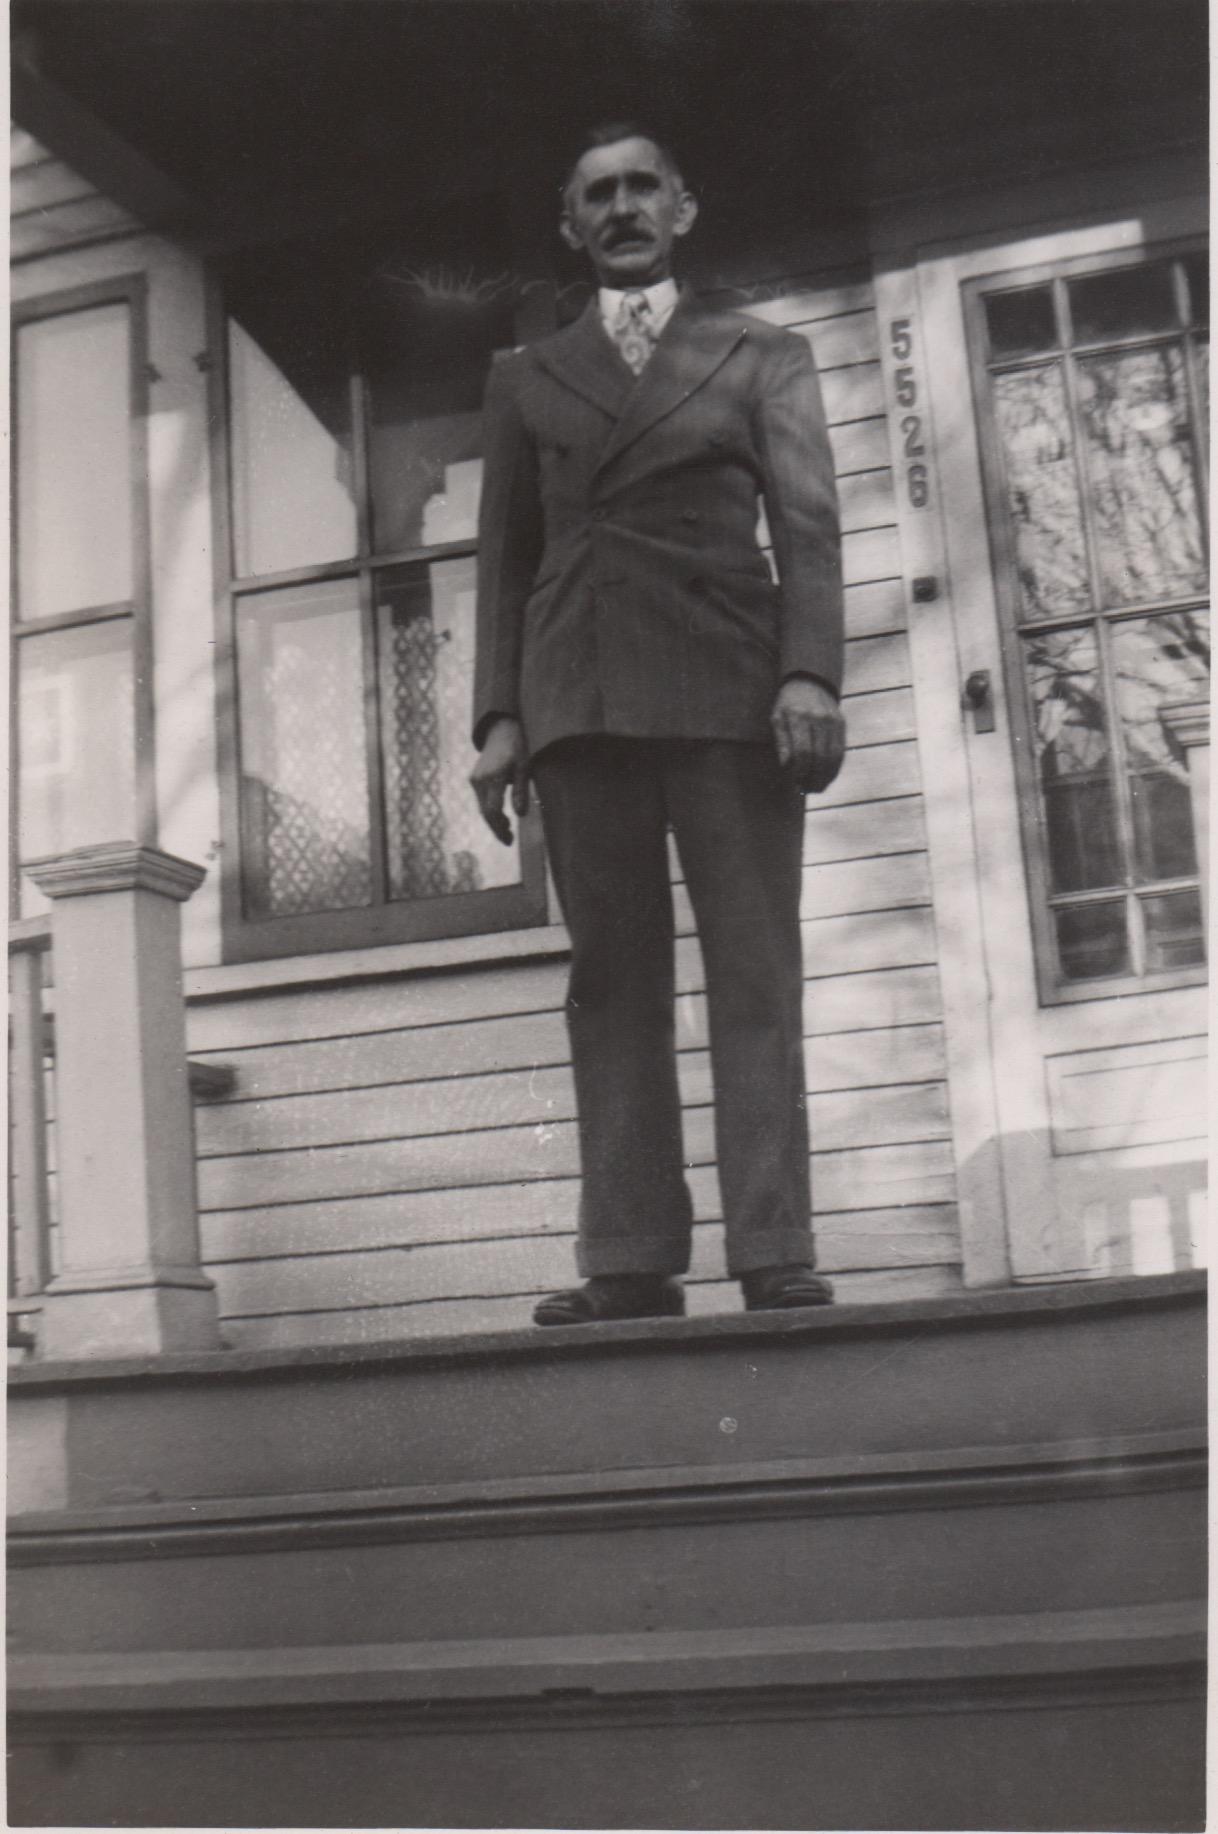 Adam at 5526 Dubois St. - late 1940s